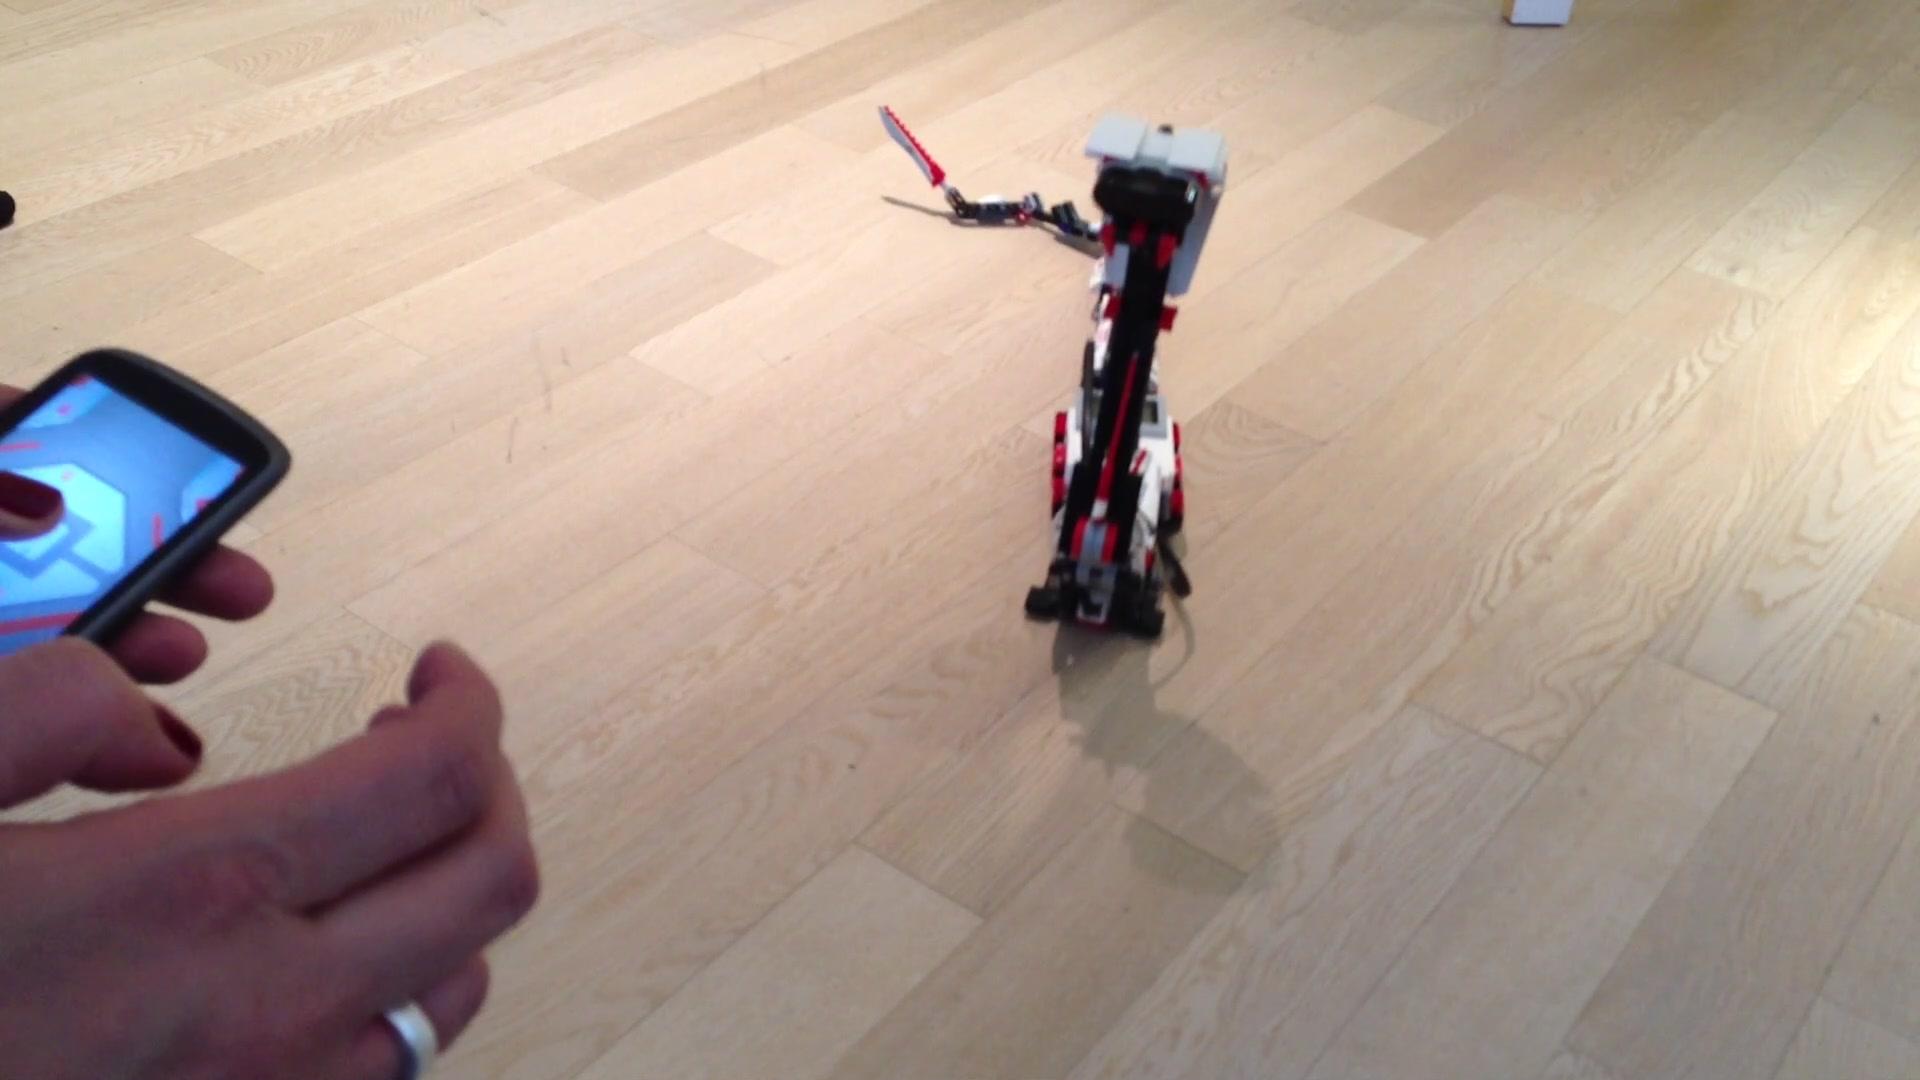 LEGO Mindstorms EV3: Next Generation of Robotic Programming